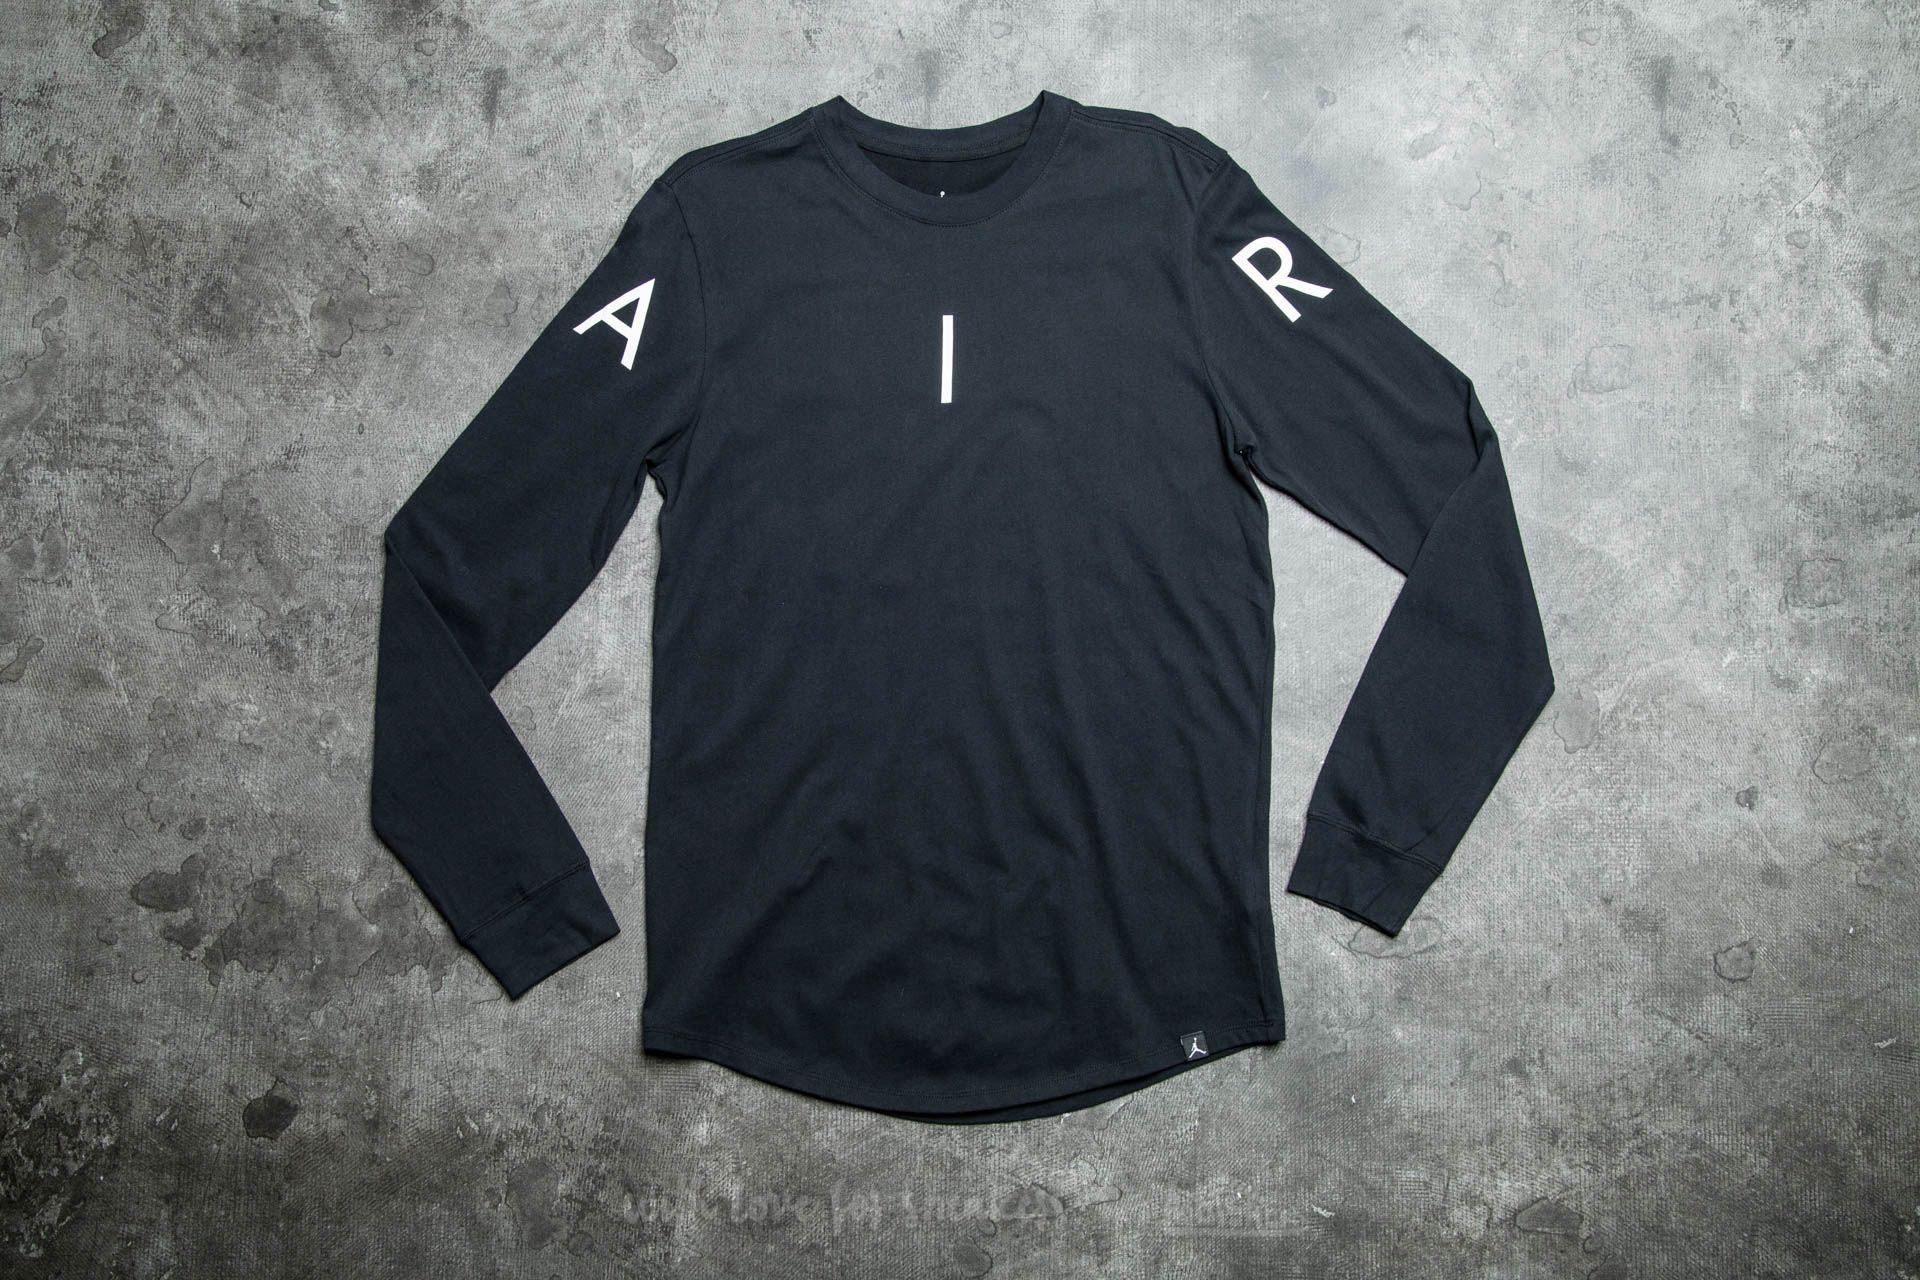 2cf1b6eece47 Jordan A.I.R. Long Sleeve Tee Black  White